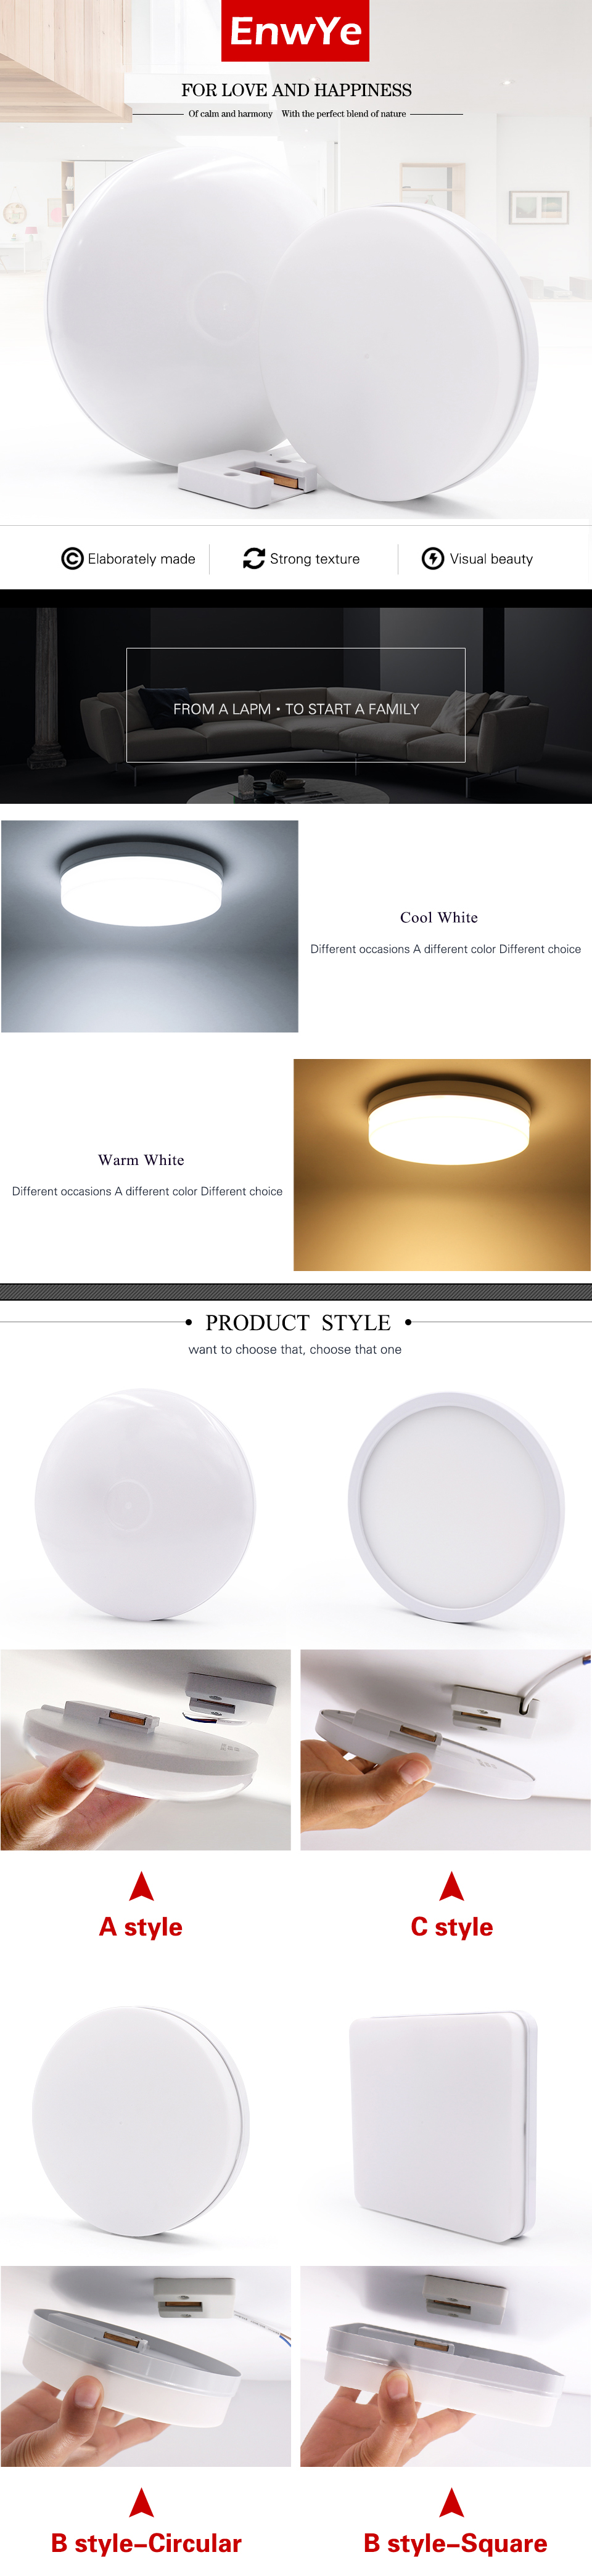 H380cae94f1c24c289a8d406f3f3f5dc0R EnwYe 6W 9W 13W 18W 24W 36W 48W LED Circular Panel Light Surface Mounted led ceiling light AC 85-265V lampada led lamp